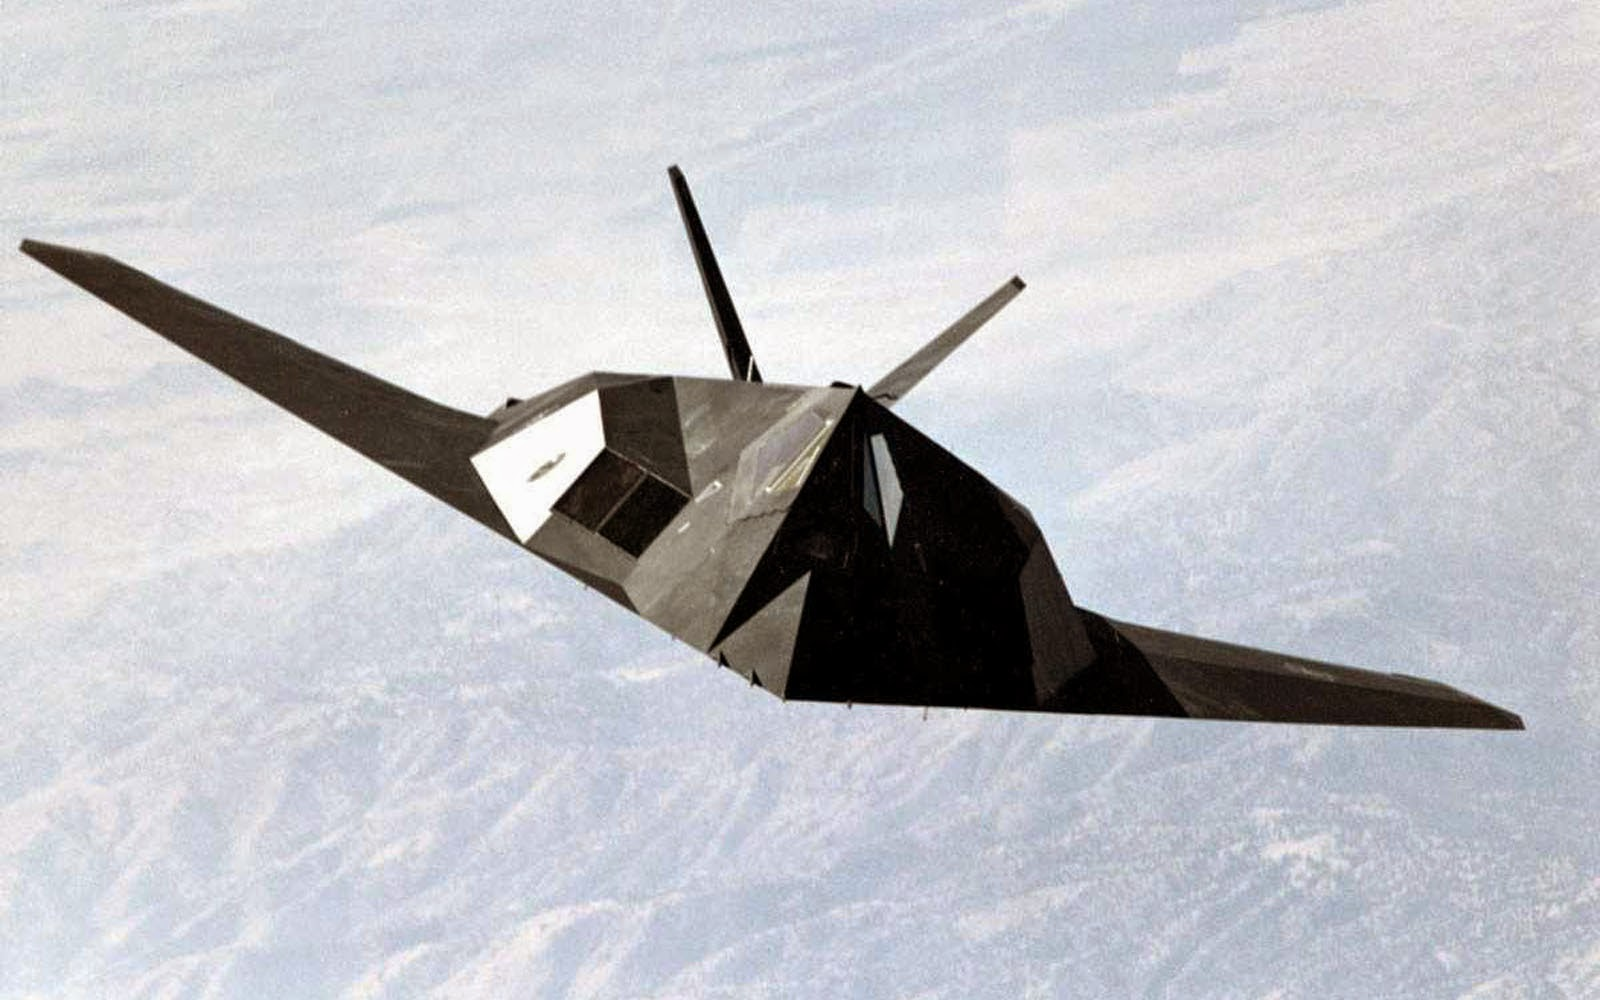 lockheed f117 nighthawk aircraft wallpapers 3d hd